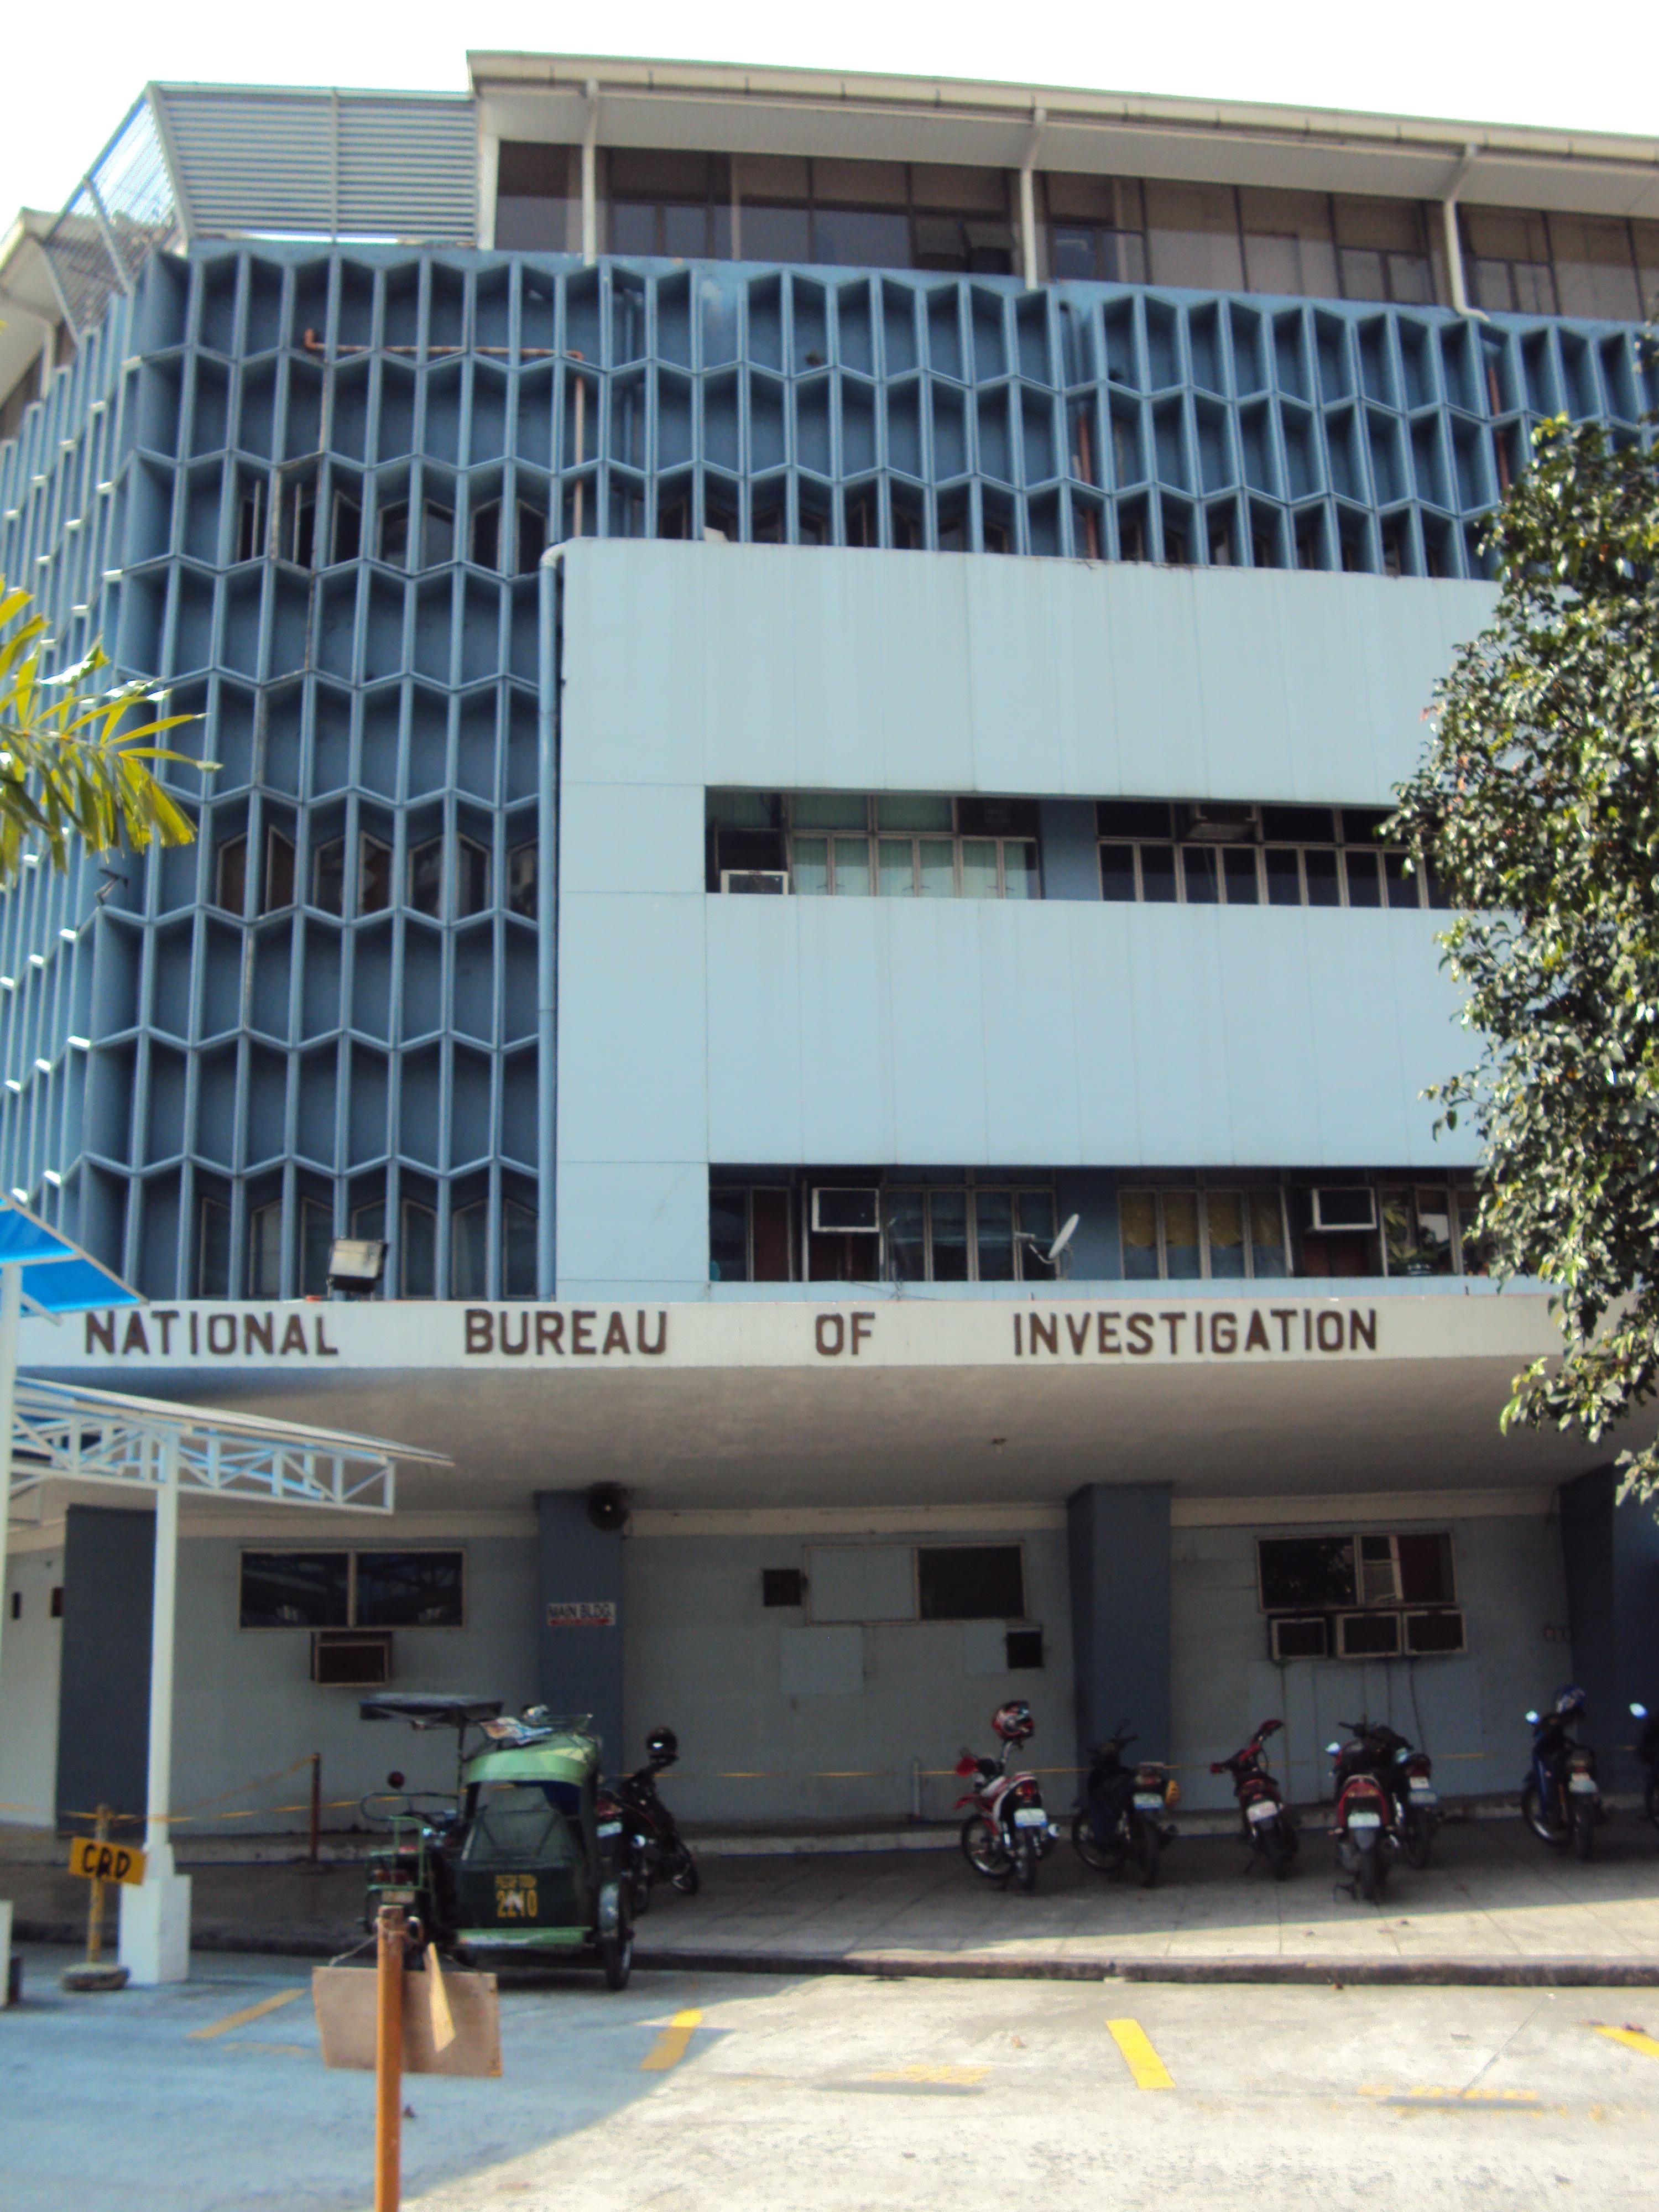 National bureau of investigation philippines wikiwand for Bureau quarantine philippines